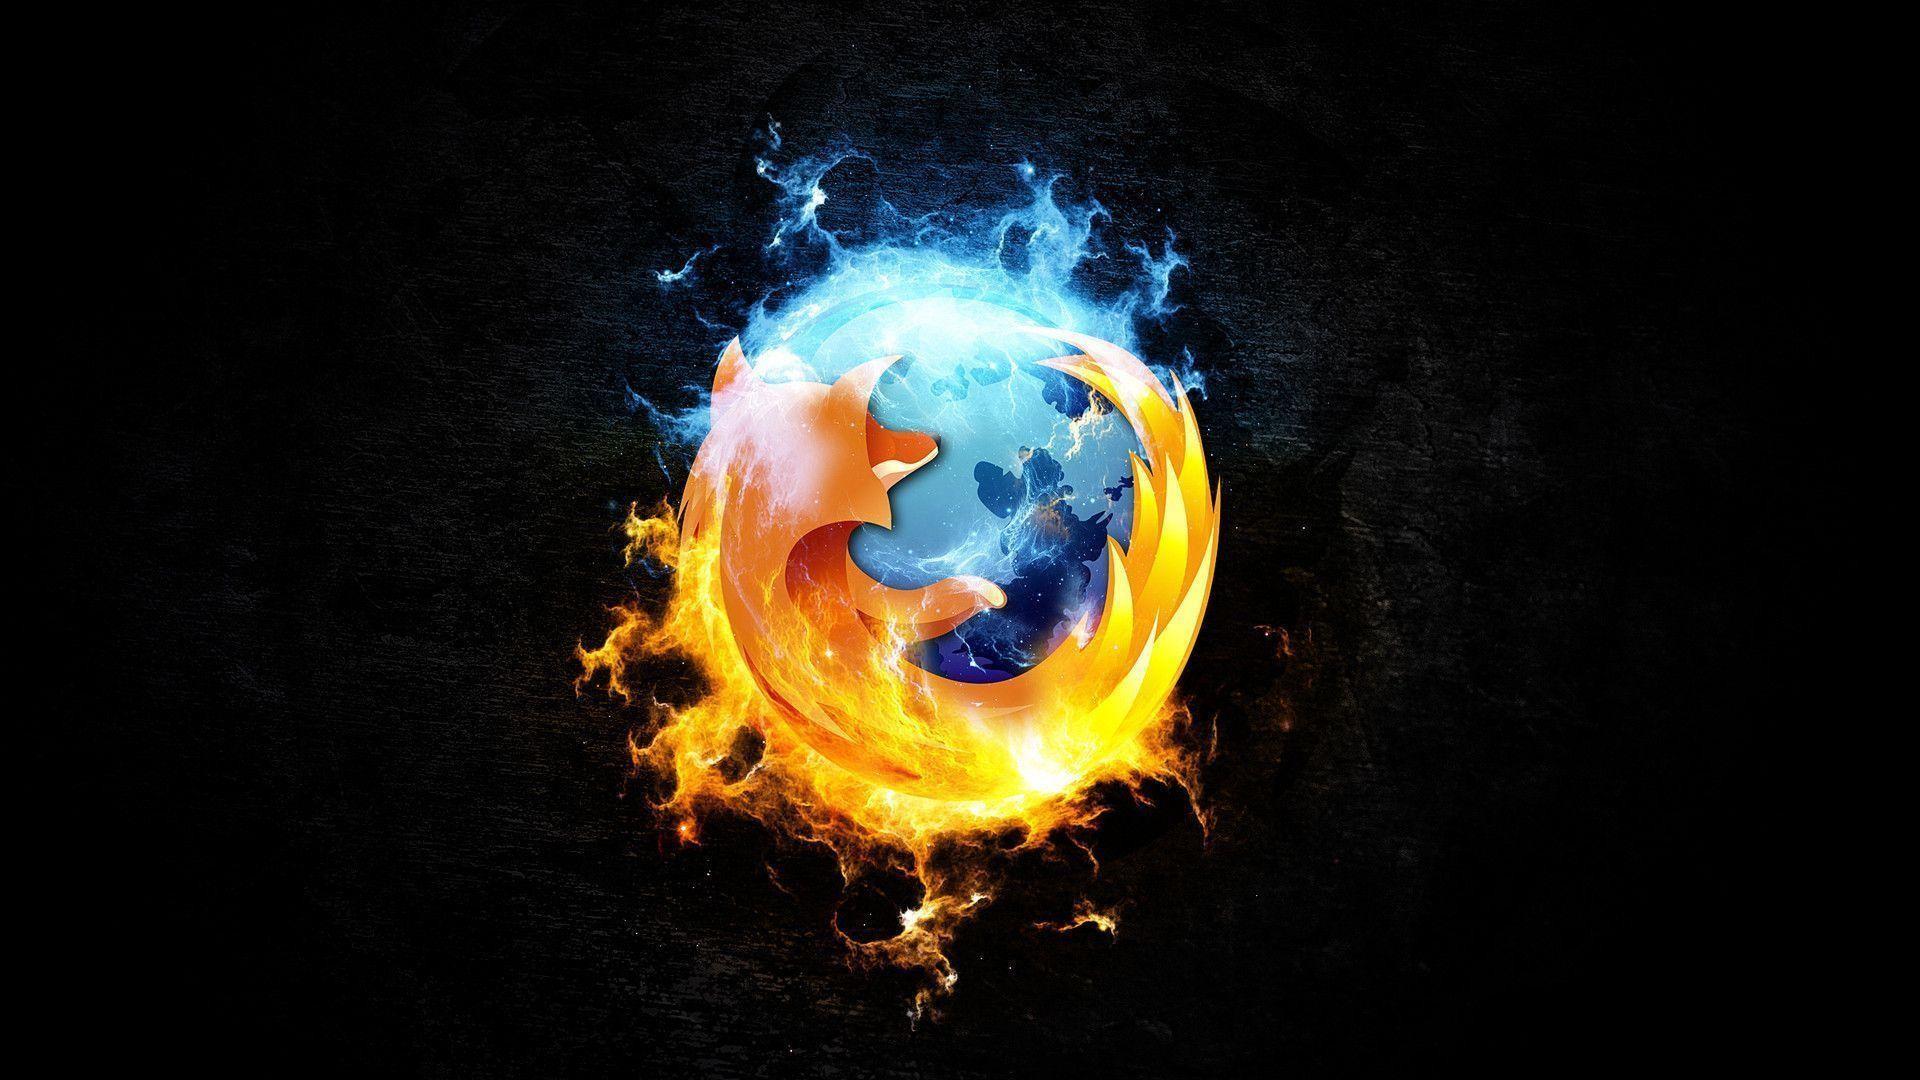 Mozilla Firefox Wallpaper Themes #3380 Wallpaper   coverhdwallpapers.